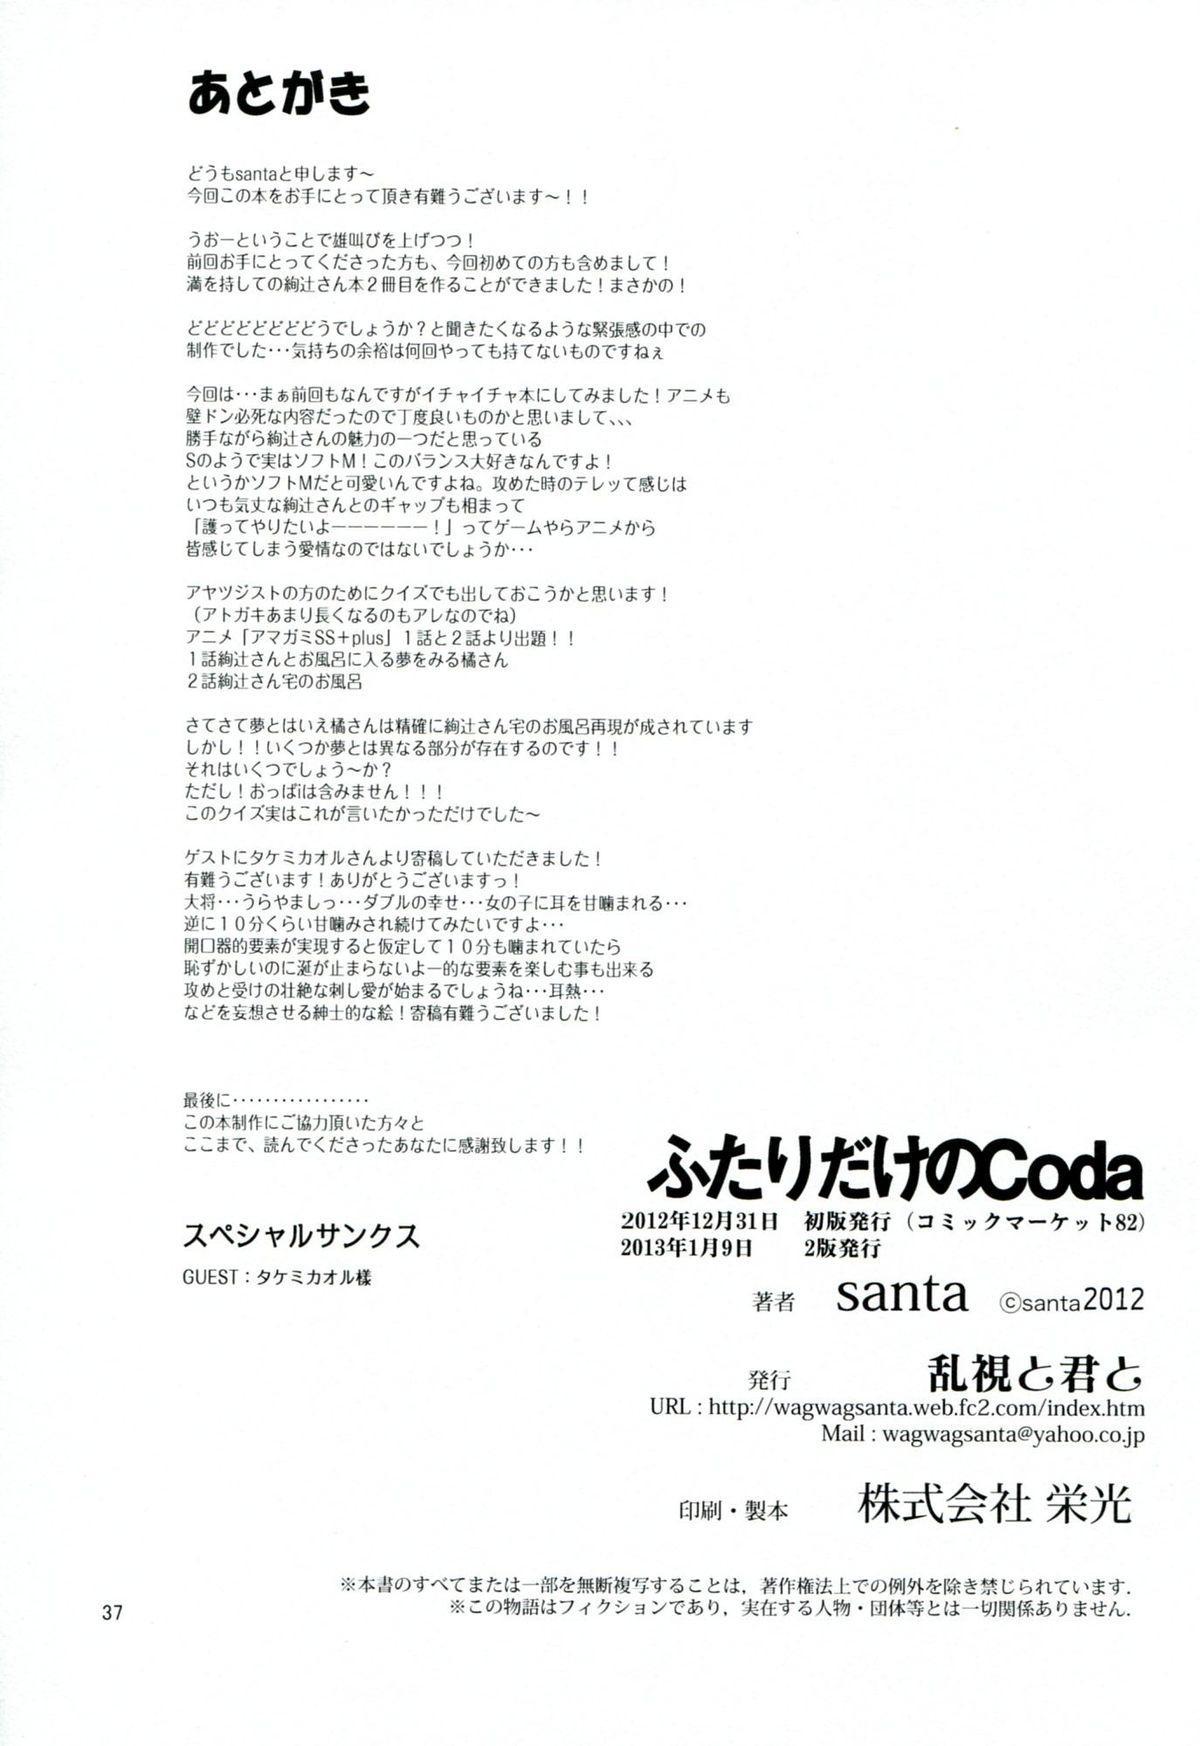 Futari dake no Coda 37